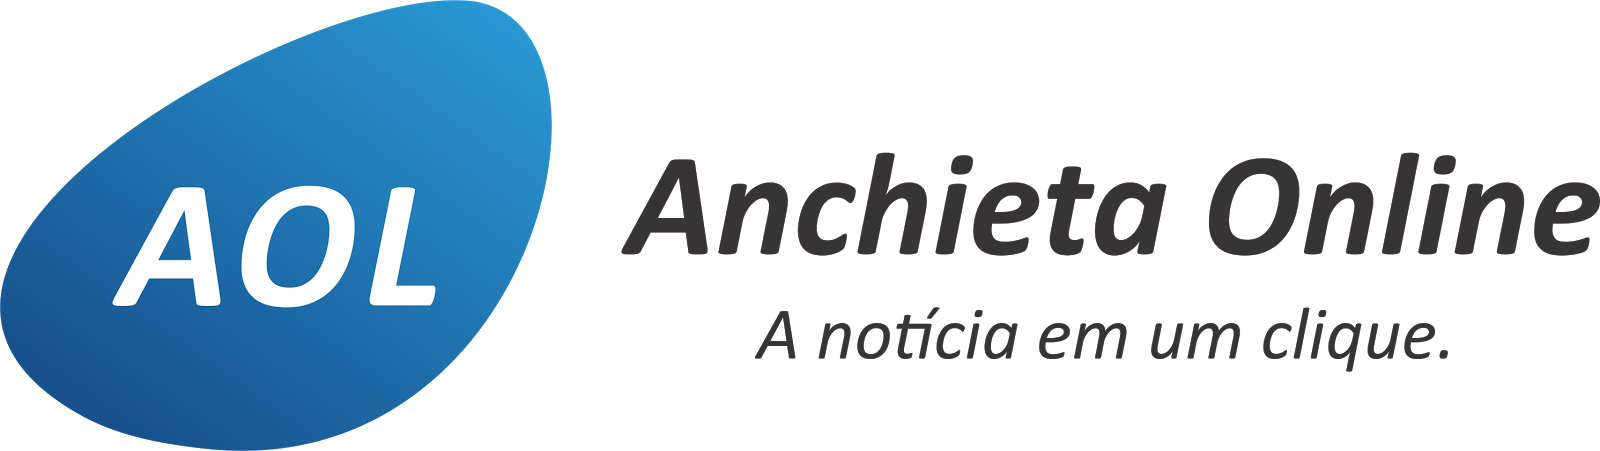 Anchieta Online